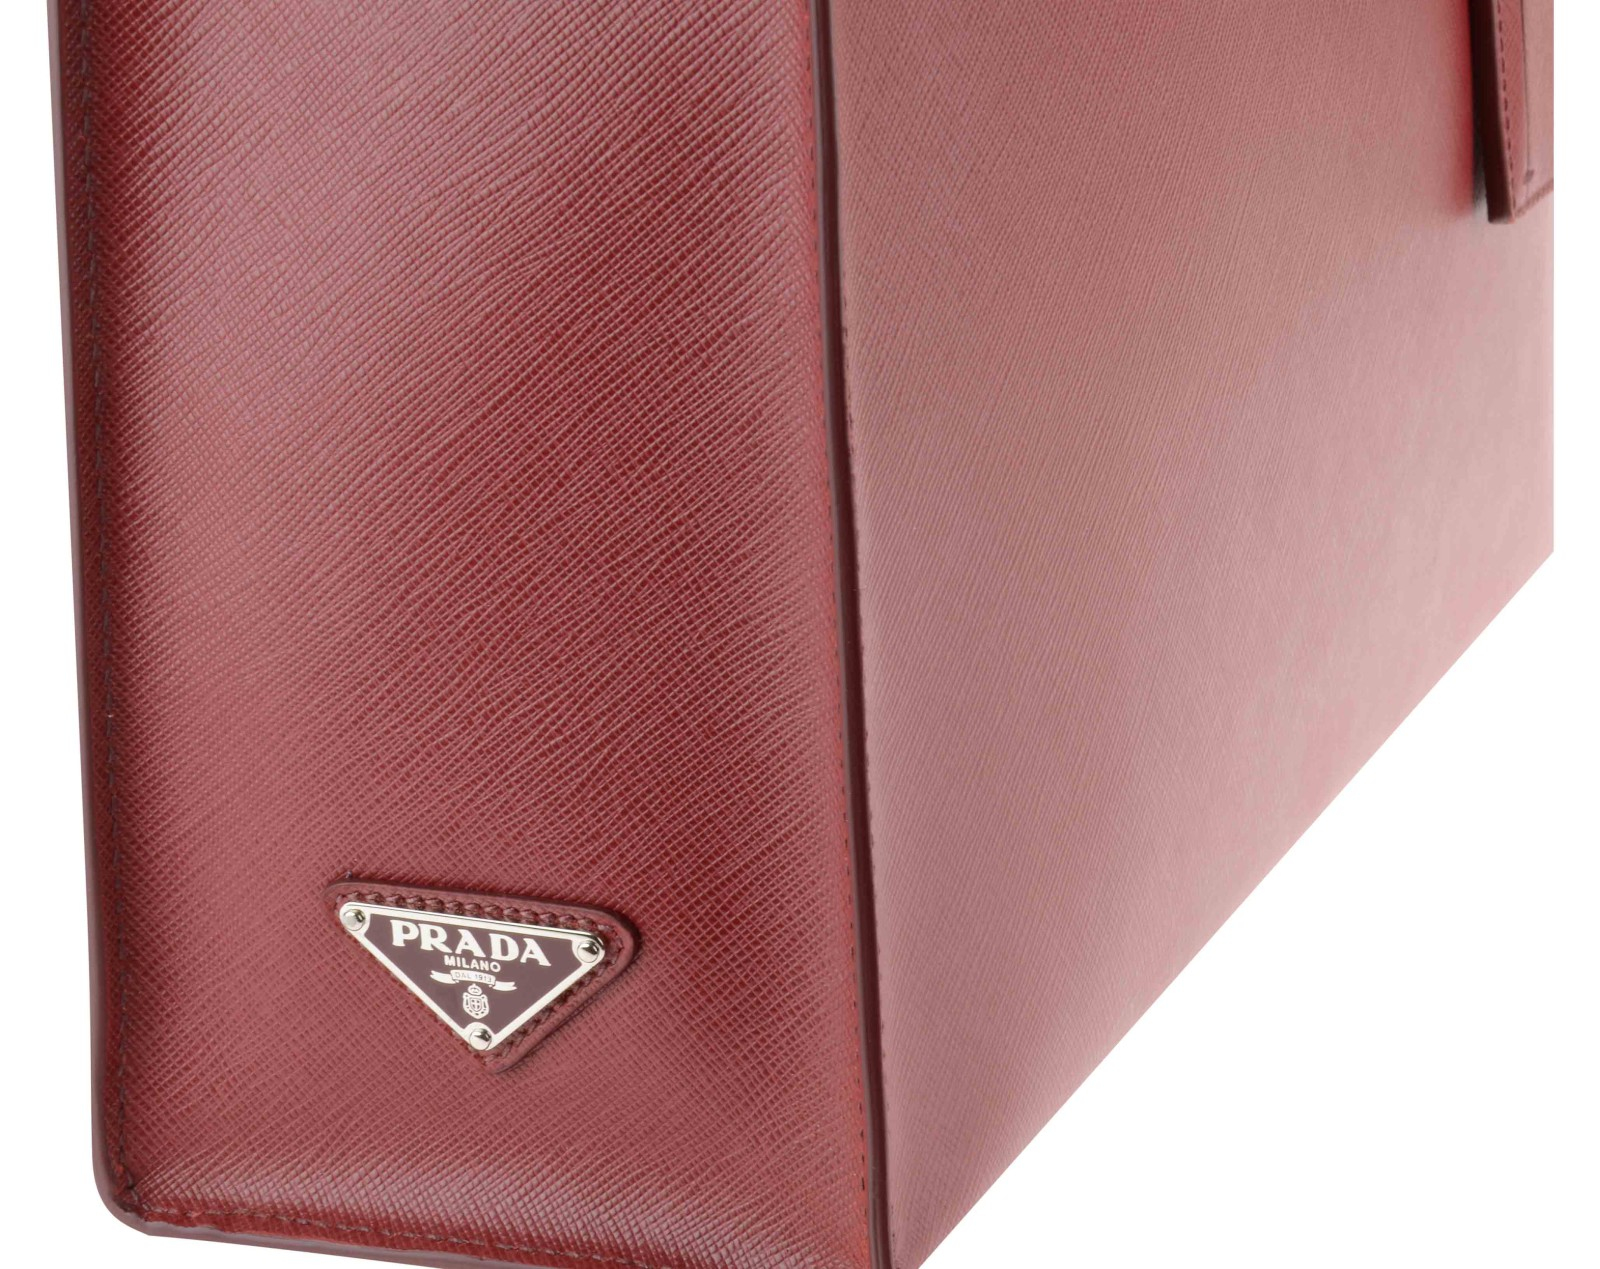 prada crossbody satchel - Prada Borsa Viaggio Saffiano Travel Rosso Rubino Info: Chiusura in ...